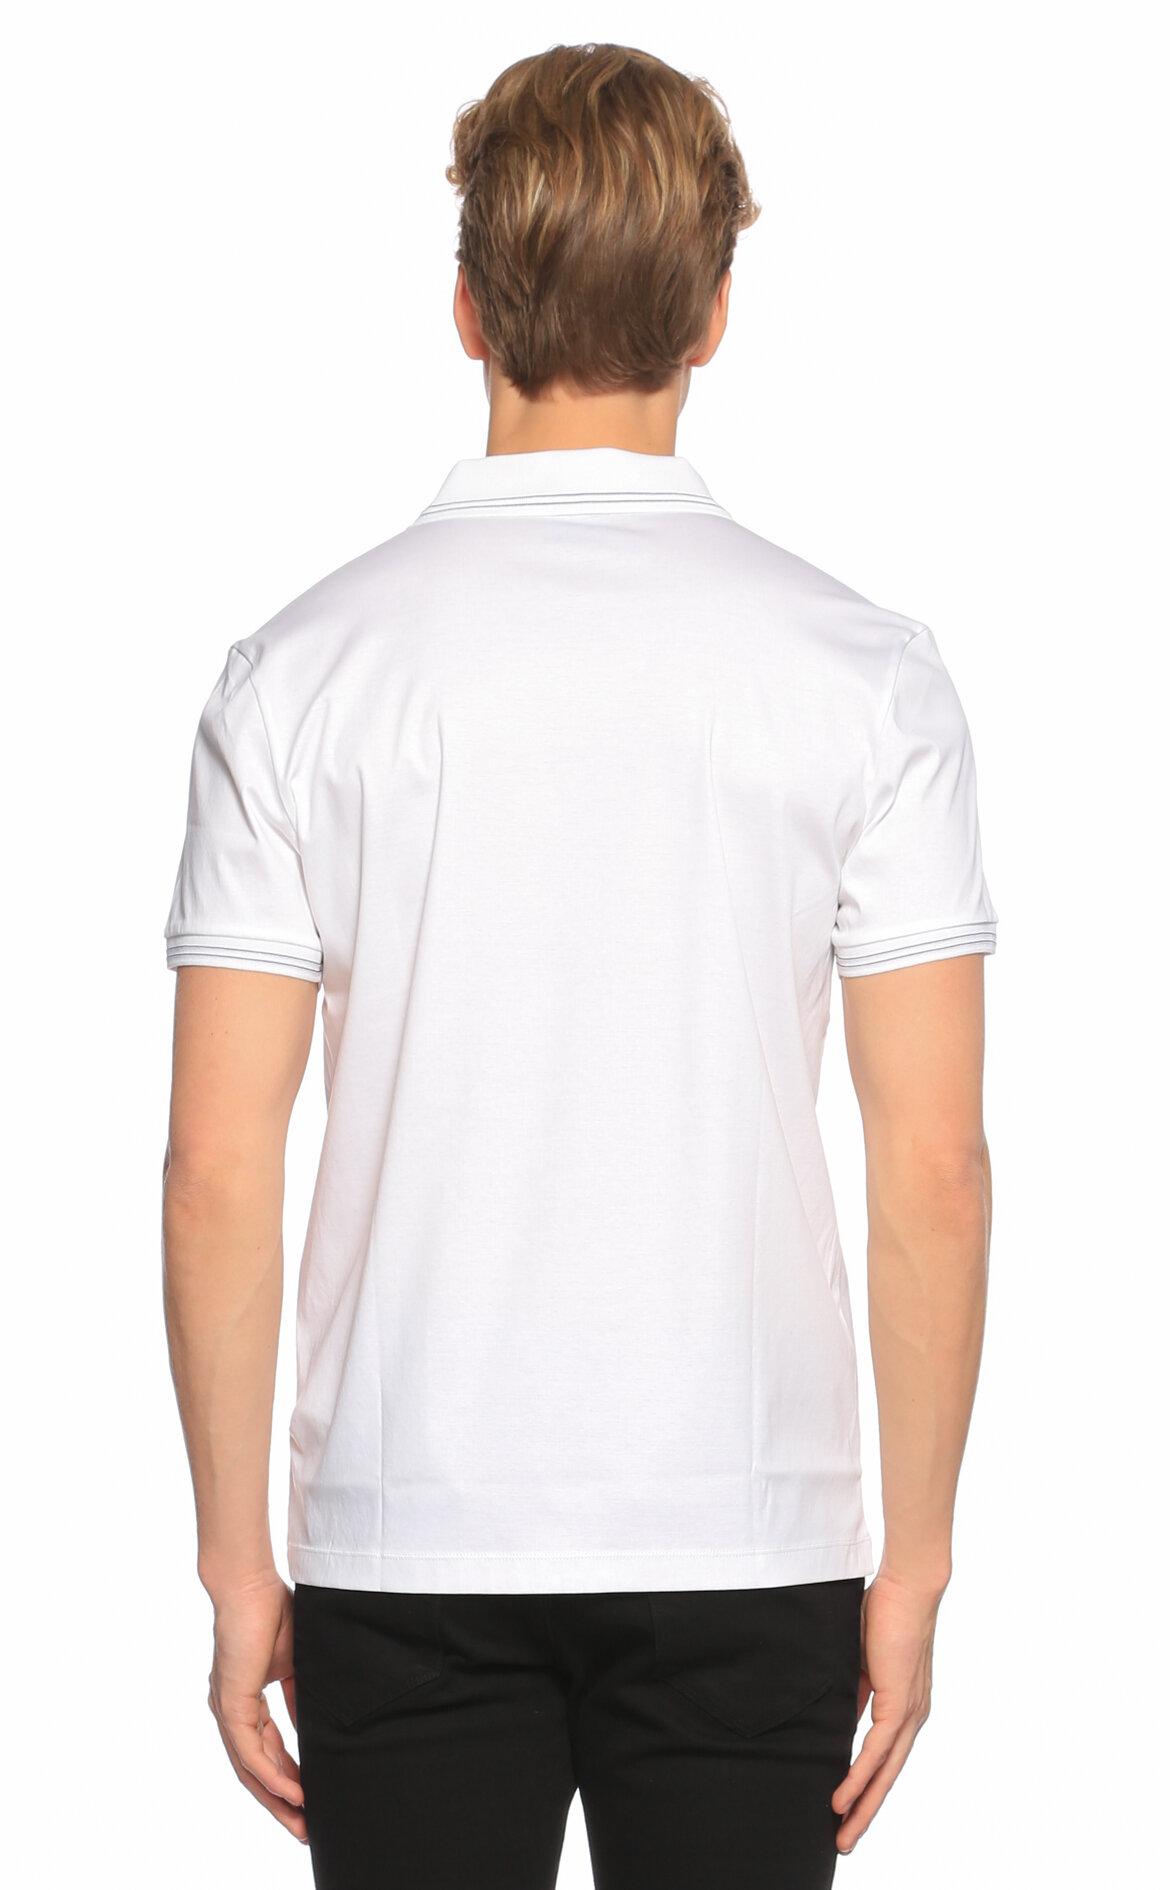 Hugo Boss Beyaz Polo T-Shirt